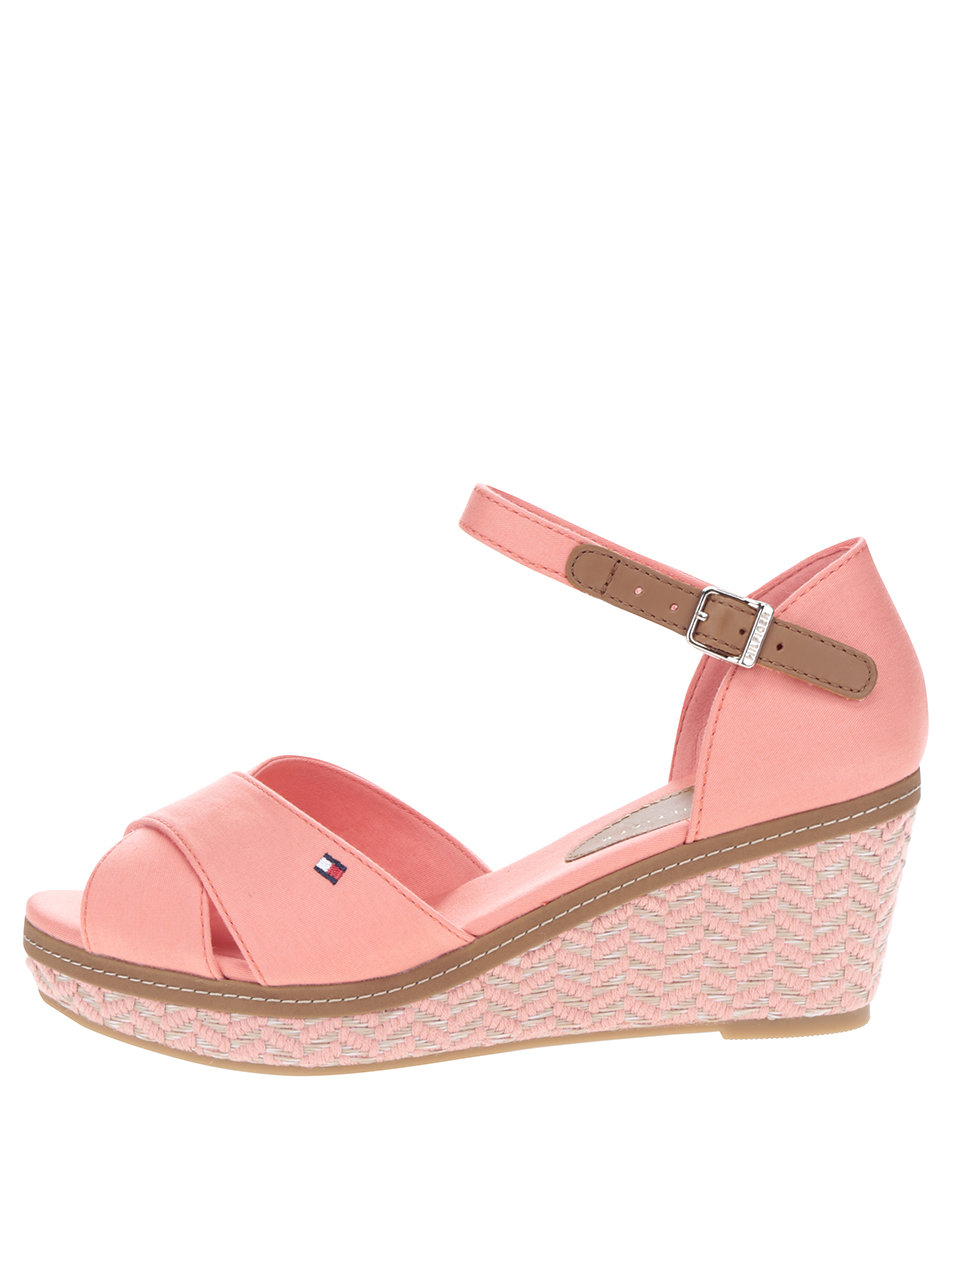 efdef140faad Koralové dámske sandále na platforme Tommy Hilfiger ...